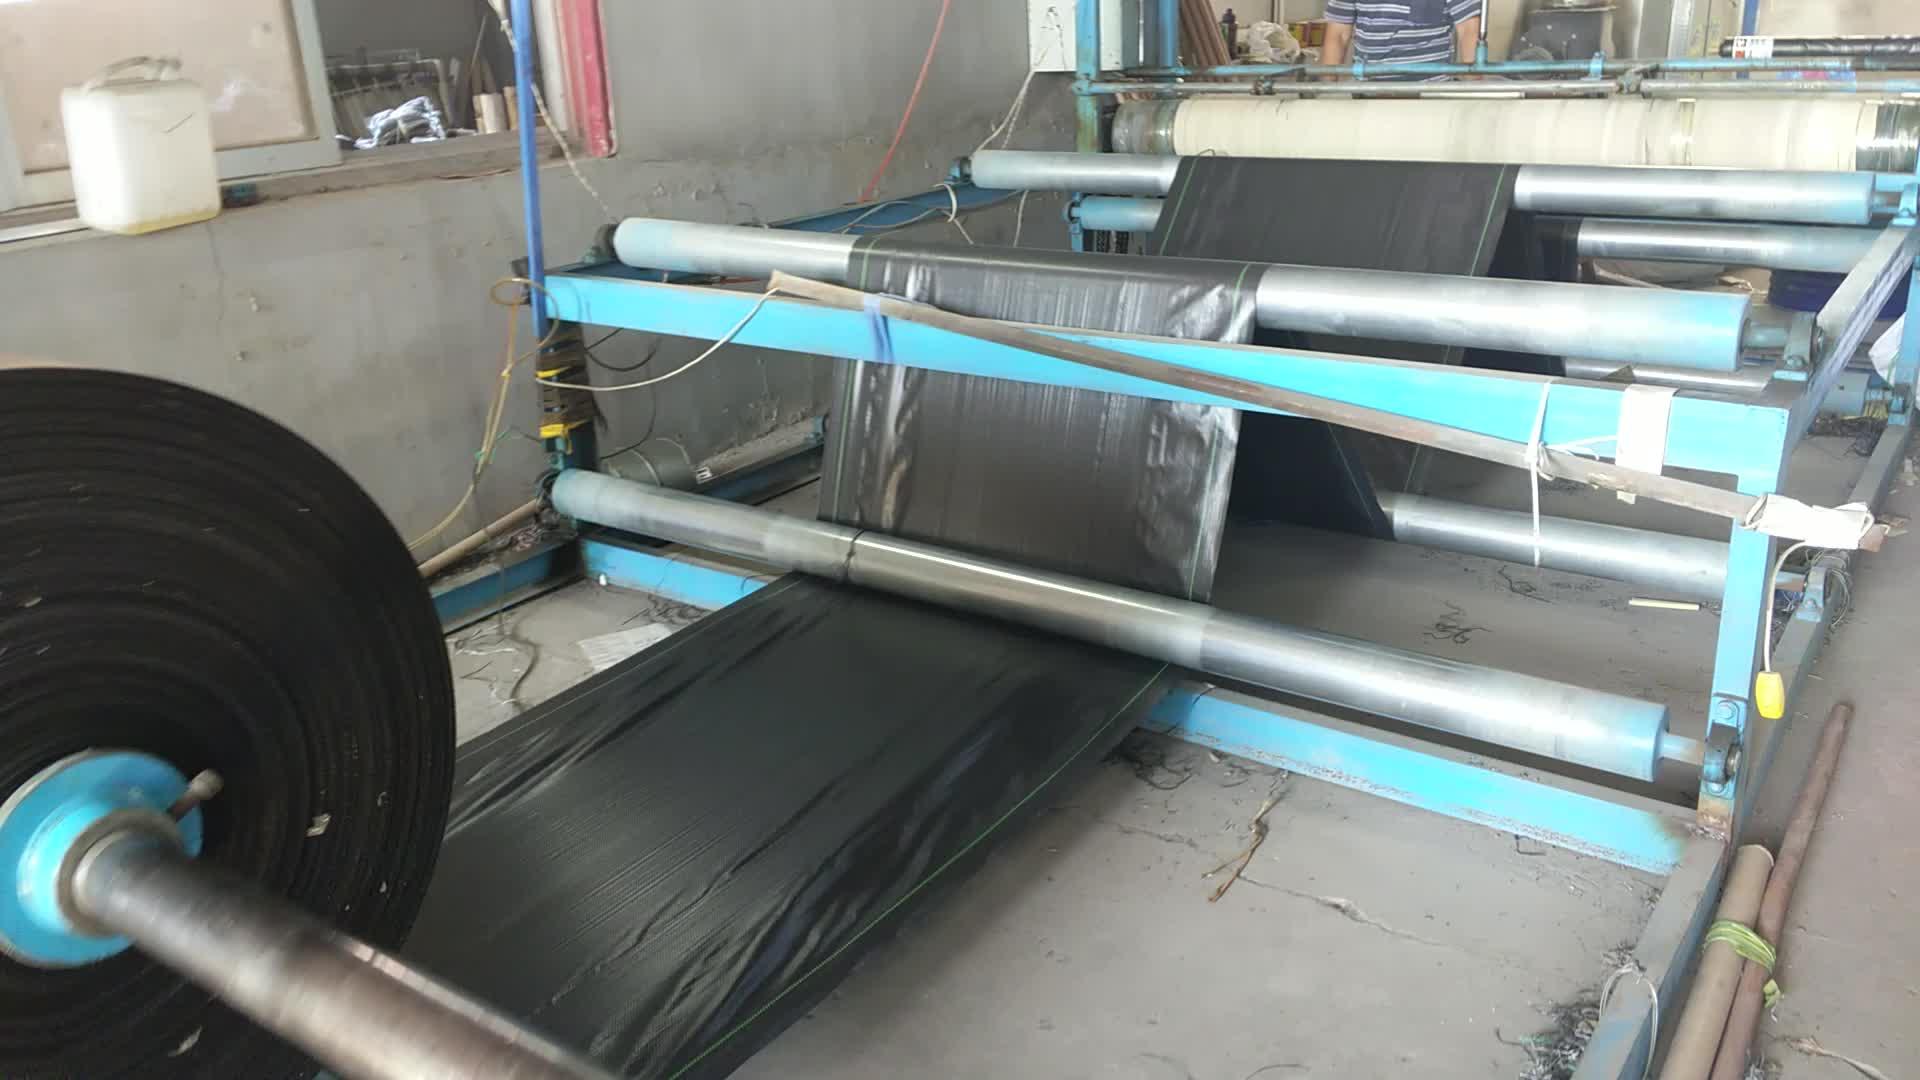 Chine fabrication robuste poubelle en plastique grande tonne sacs 1000kg grand sac jumbo sacs